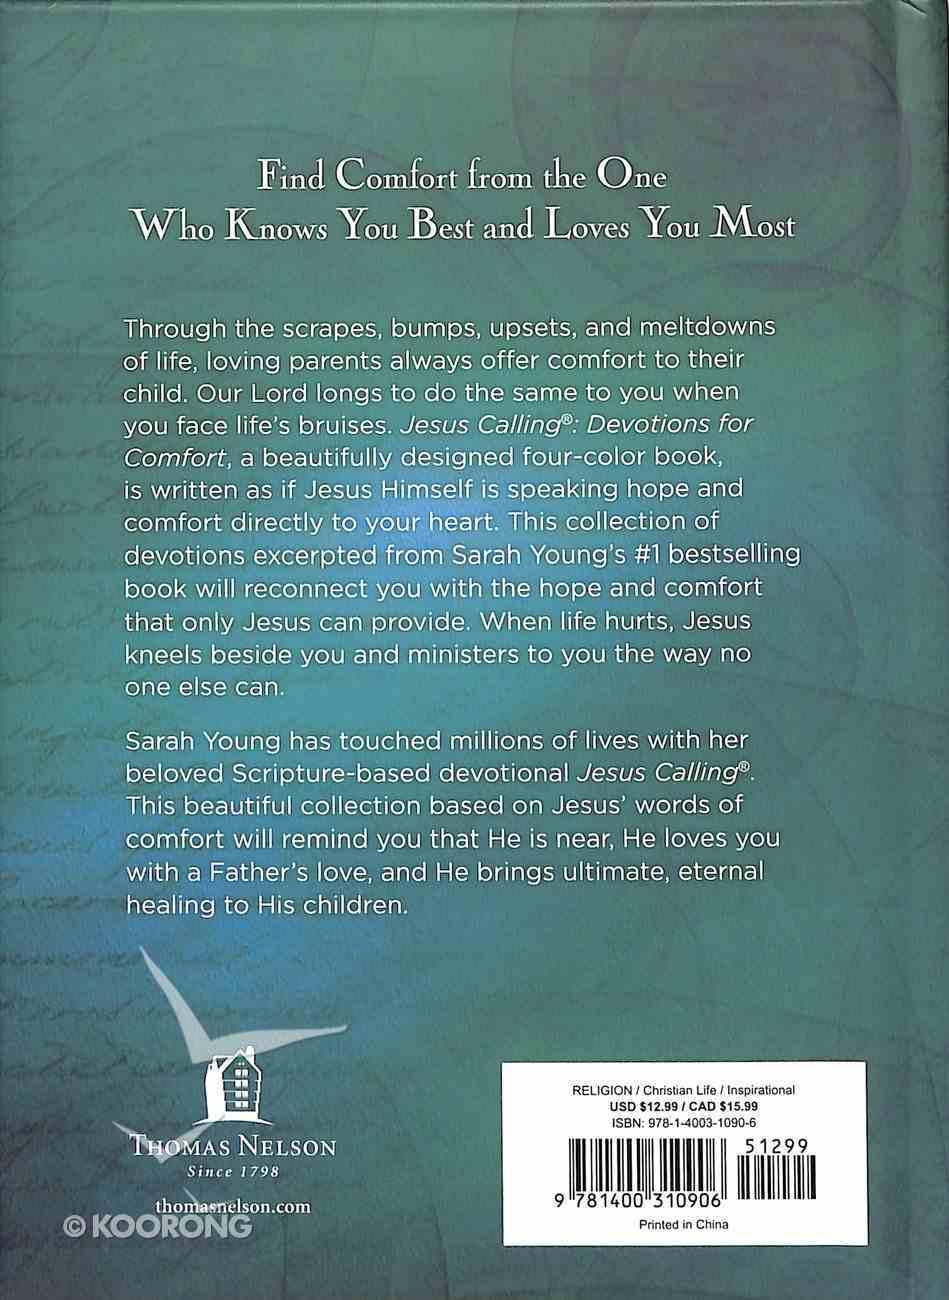 Jesus Calling 50 Devotions For Comfort Hardback